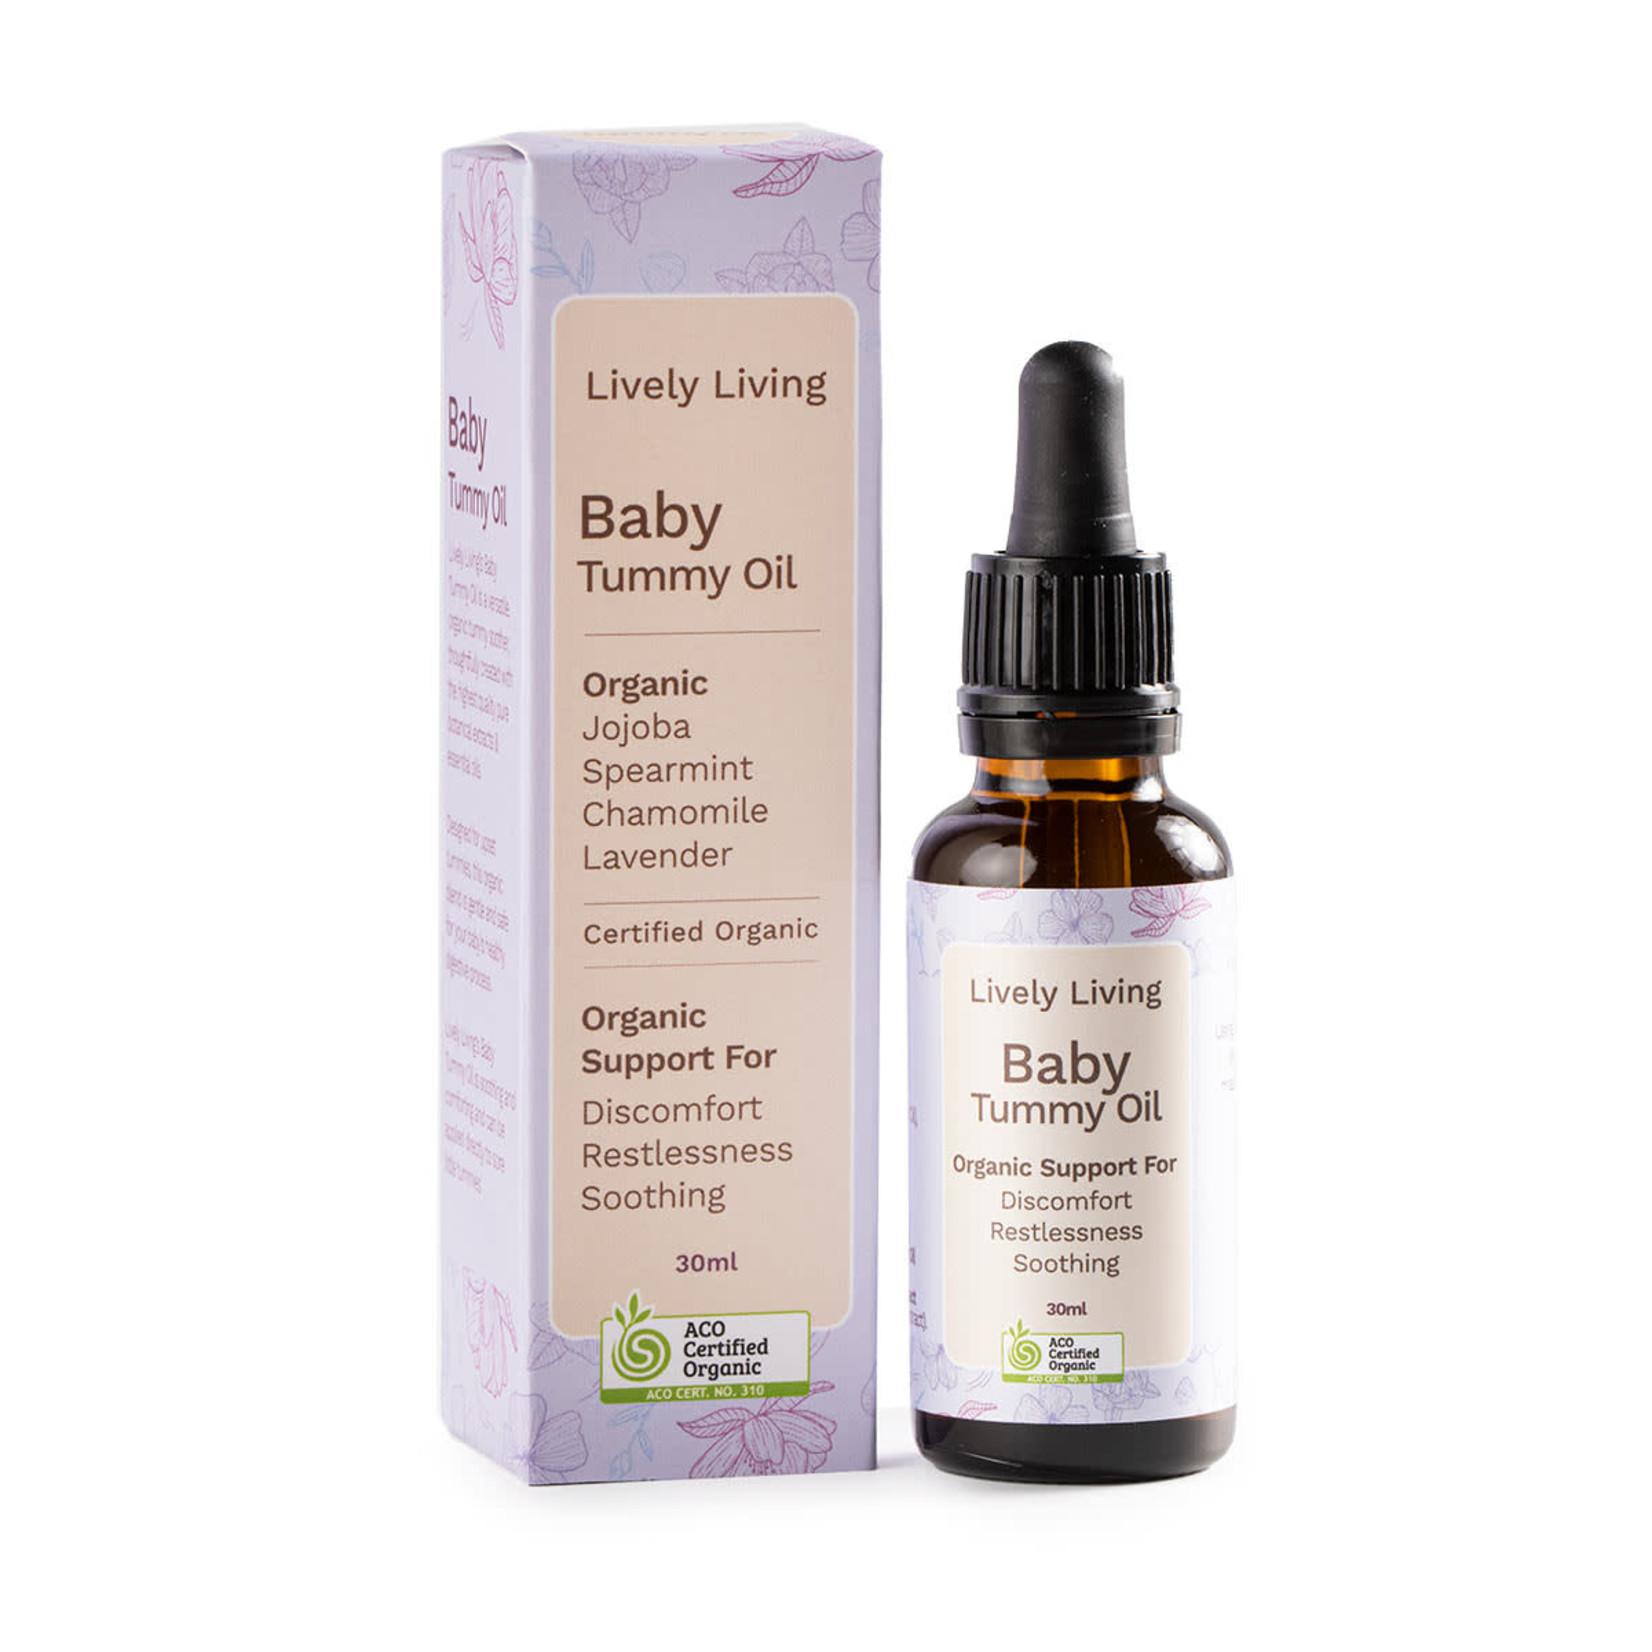 Lively Living Lively Living Organic Baby Tummy Oil 50 ml